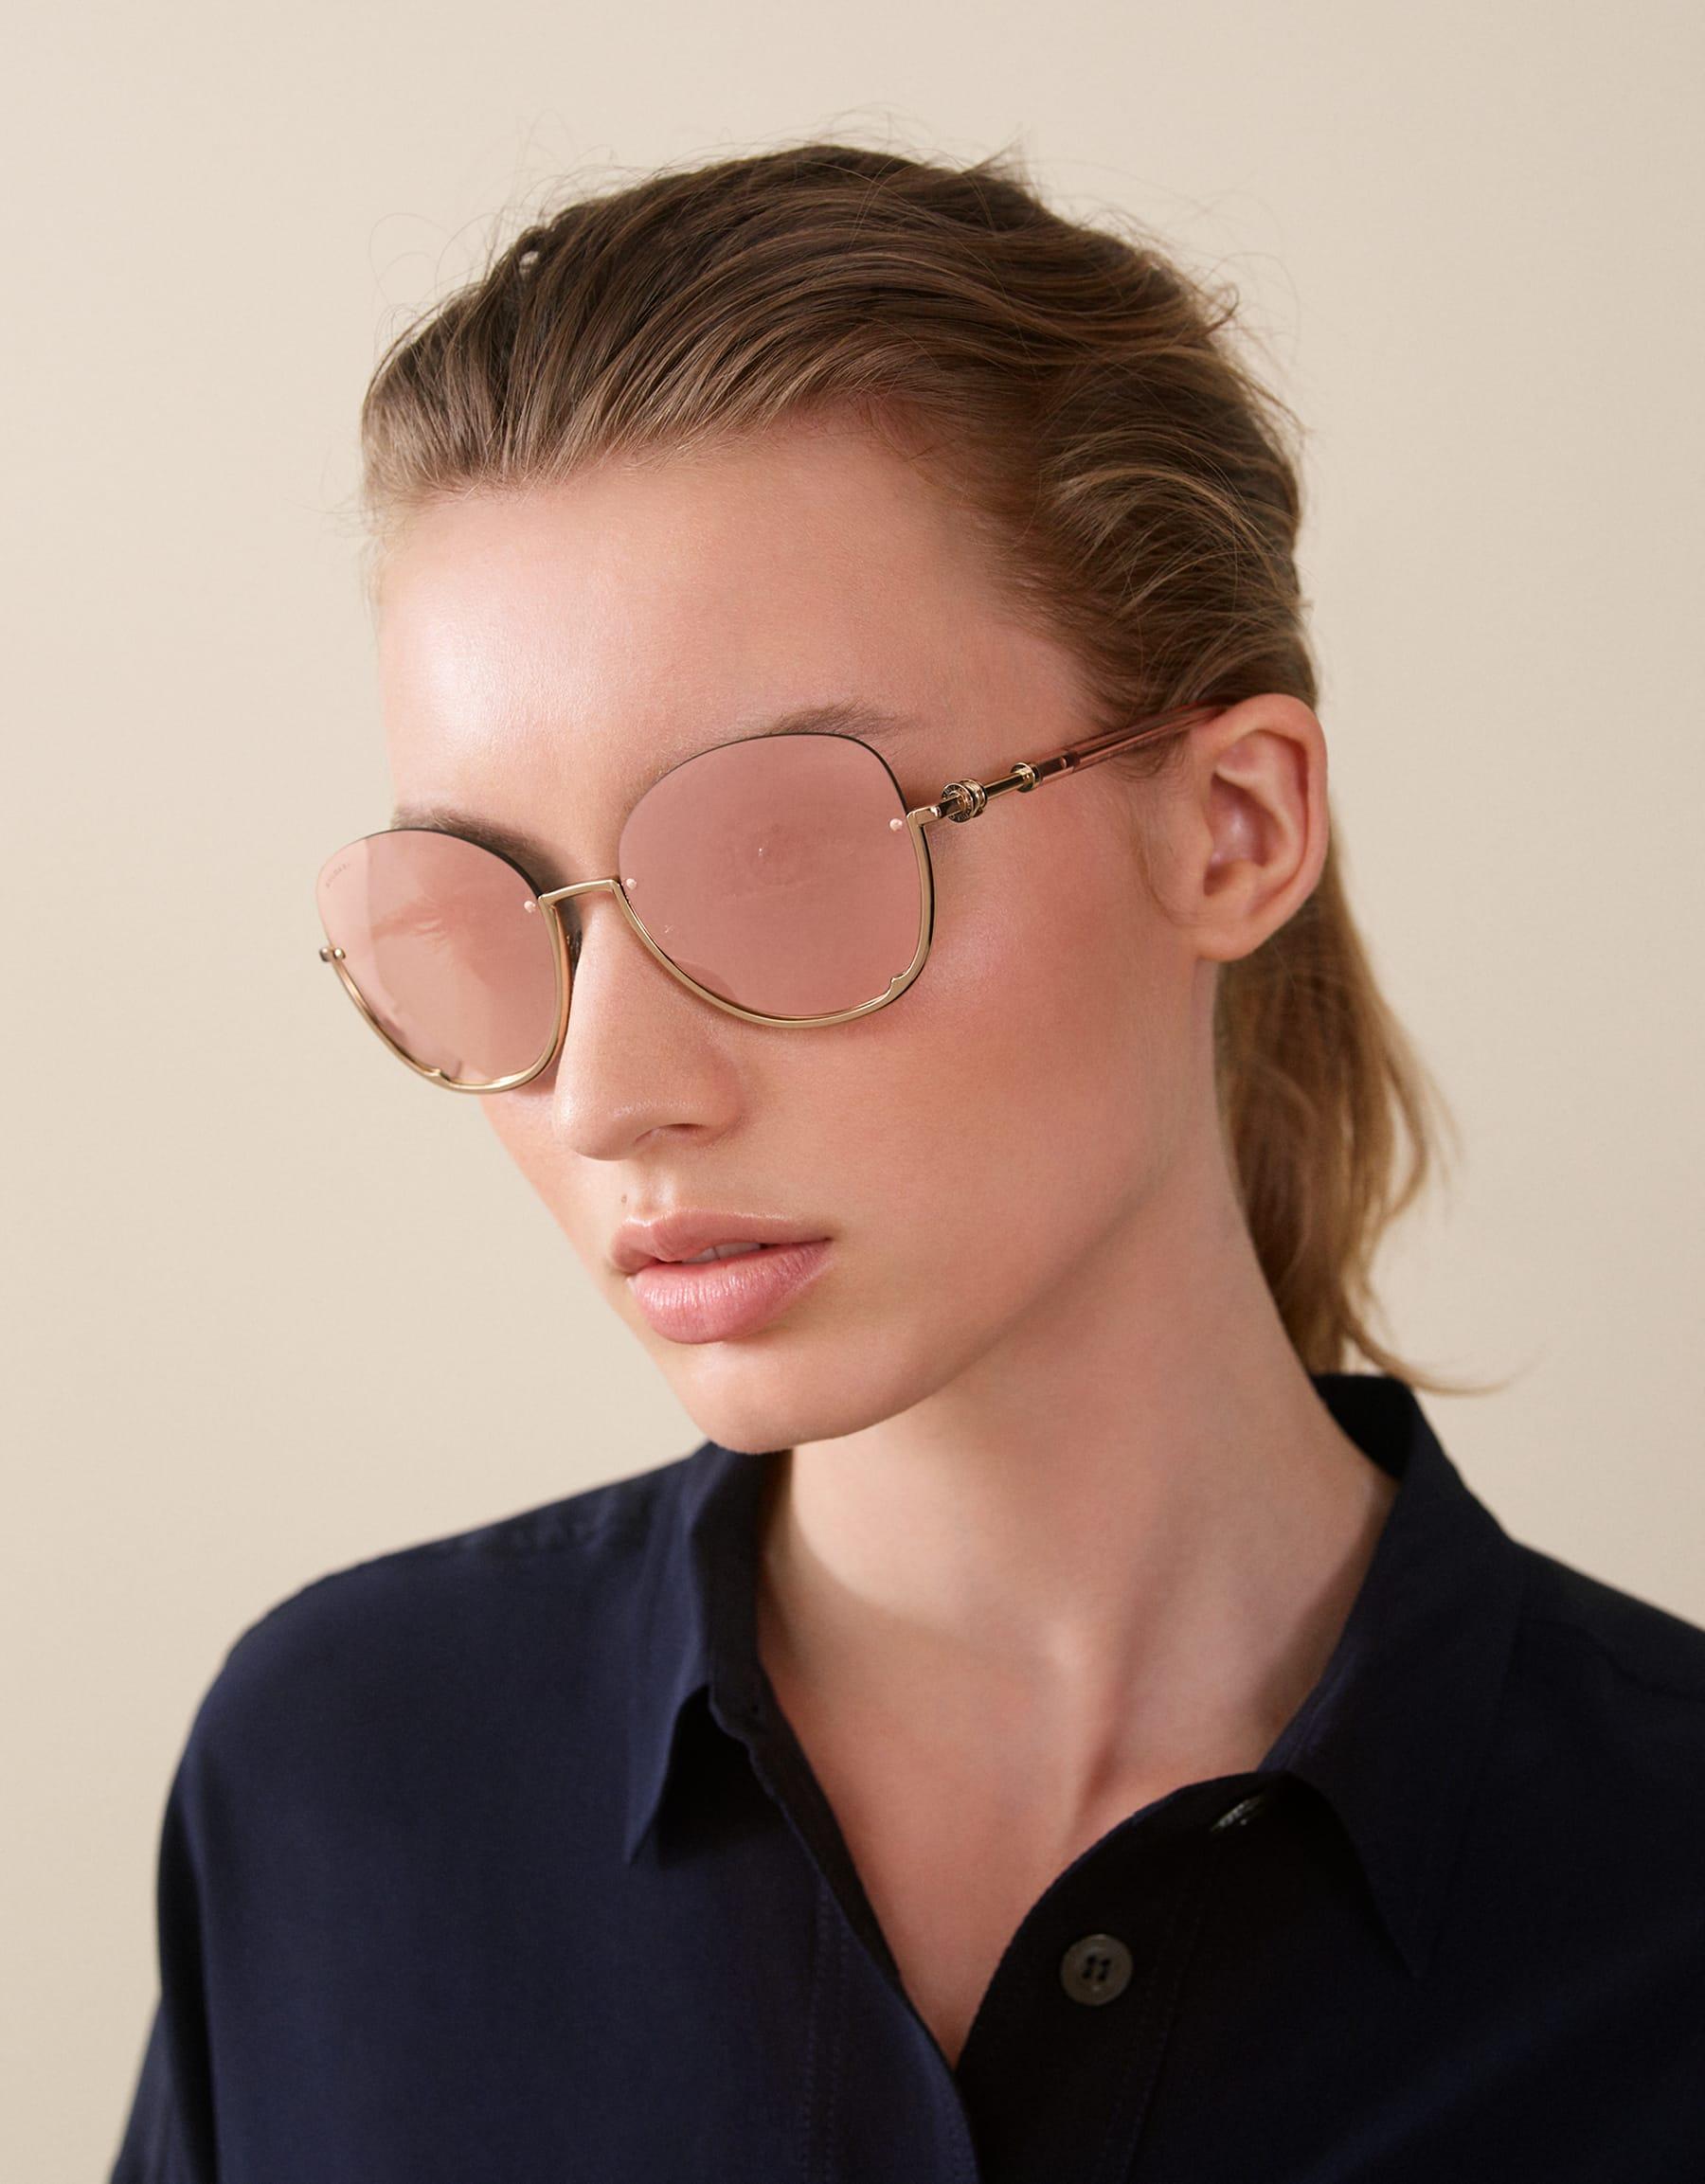 Runde Bvlgari B.zero1 Halbrand-Sonnenbrille aus Metall. 903821 image 3